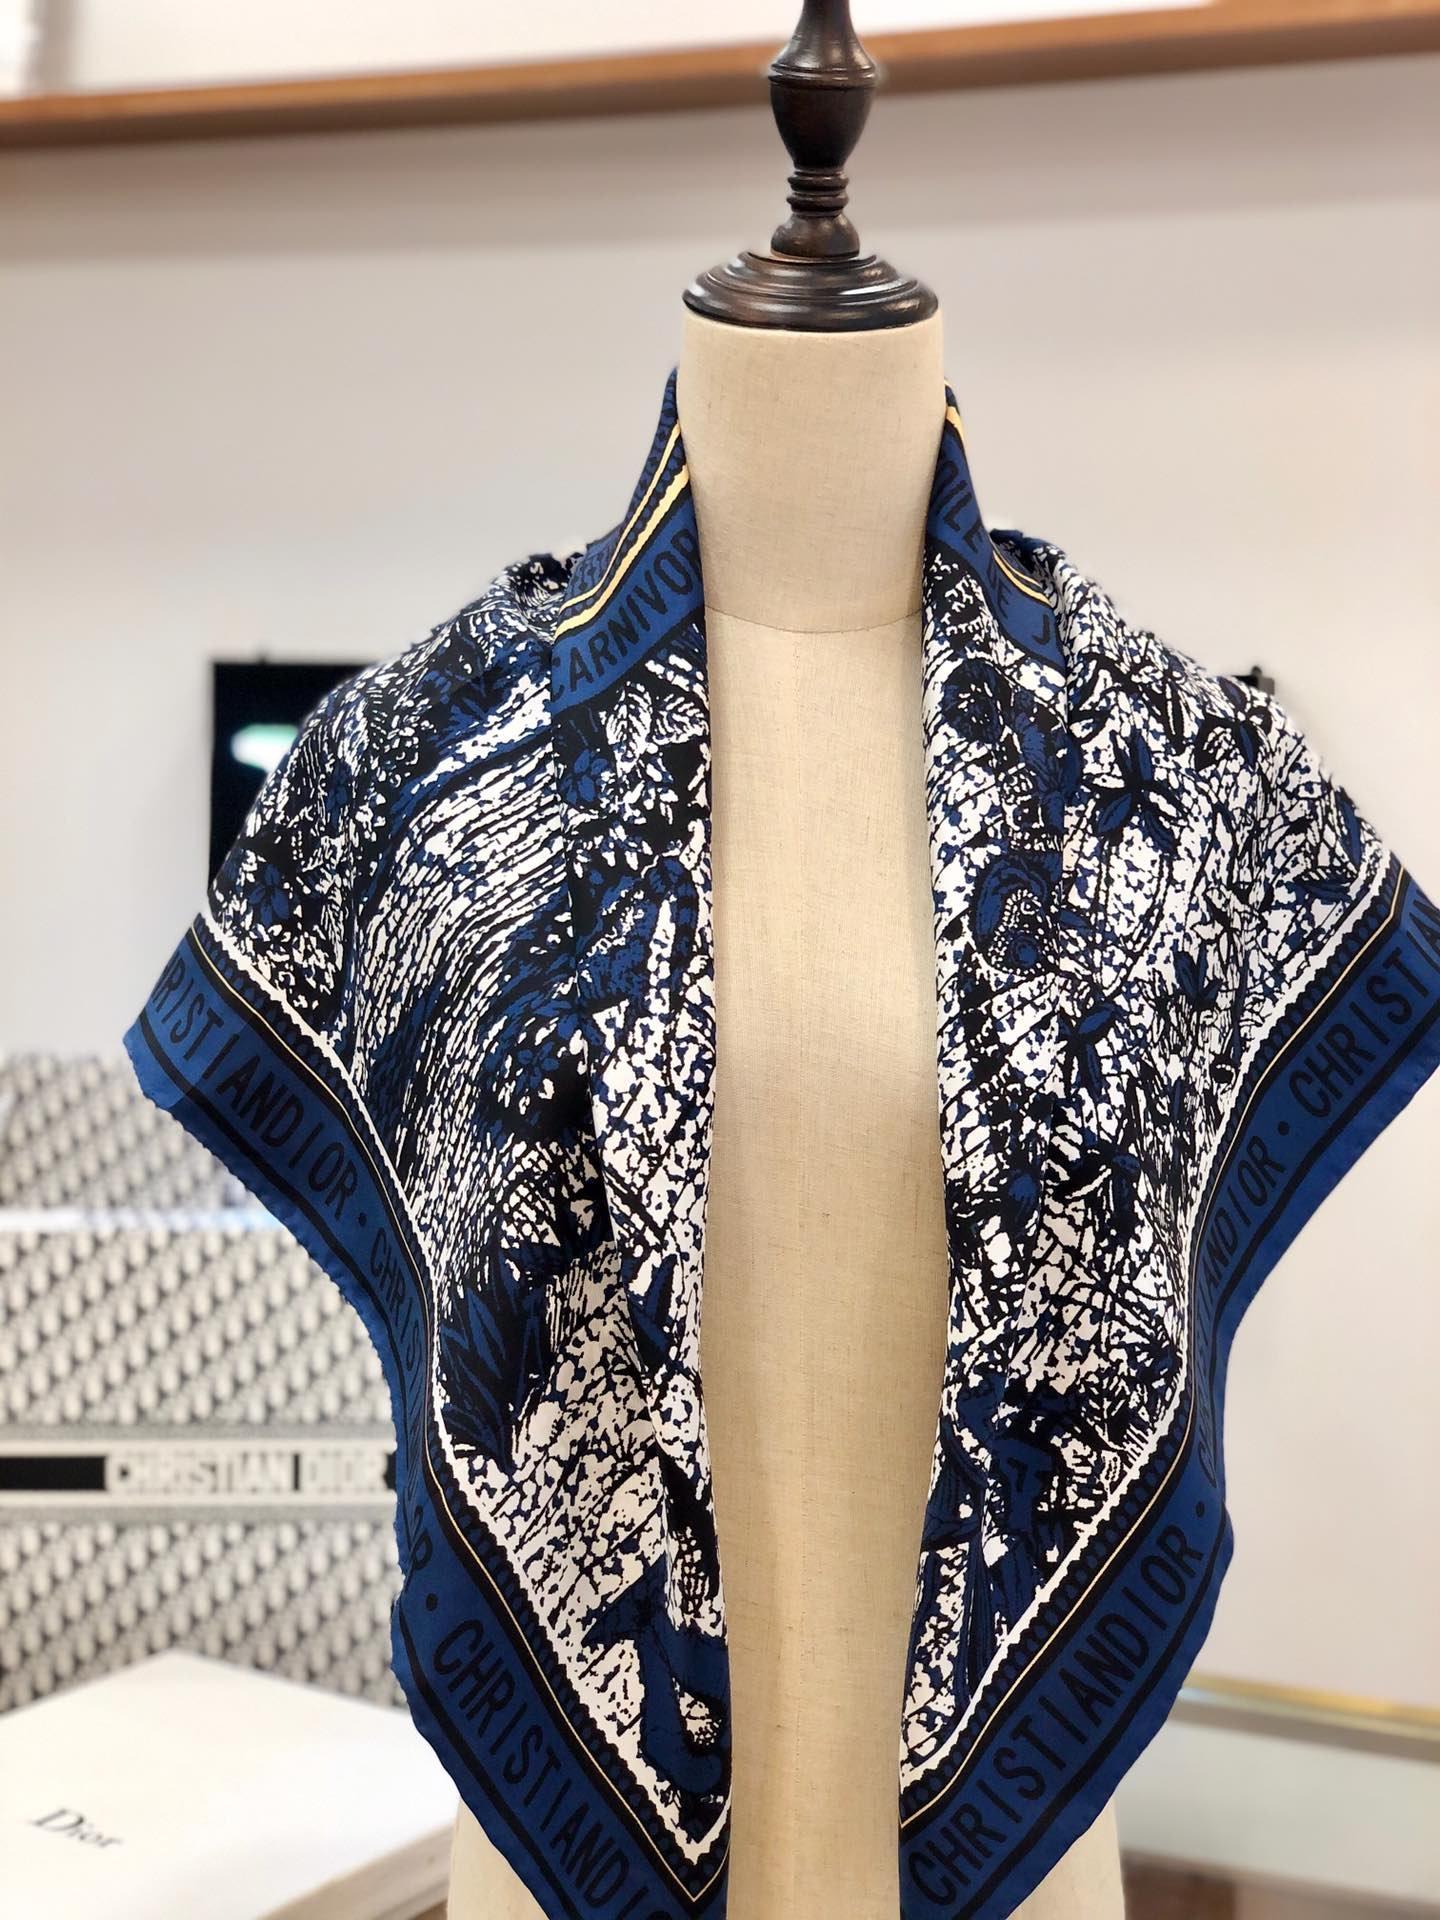 Dior丝巾 100%真丝 手工卷边丝巾 专柜有 售(图8)